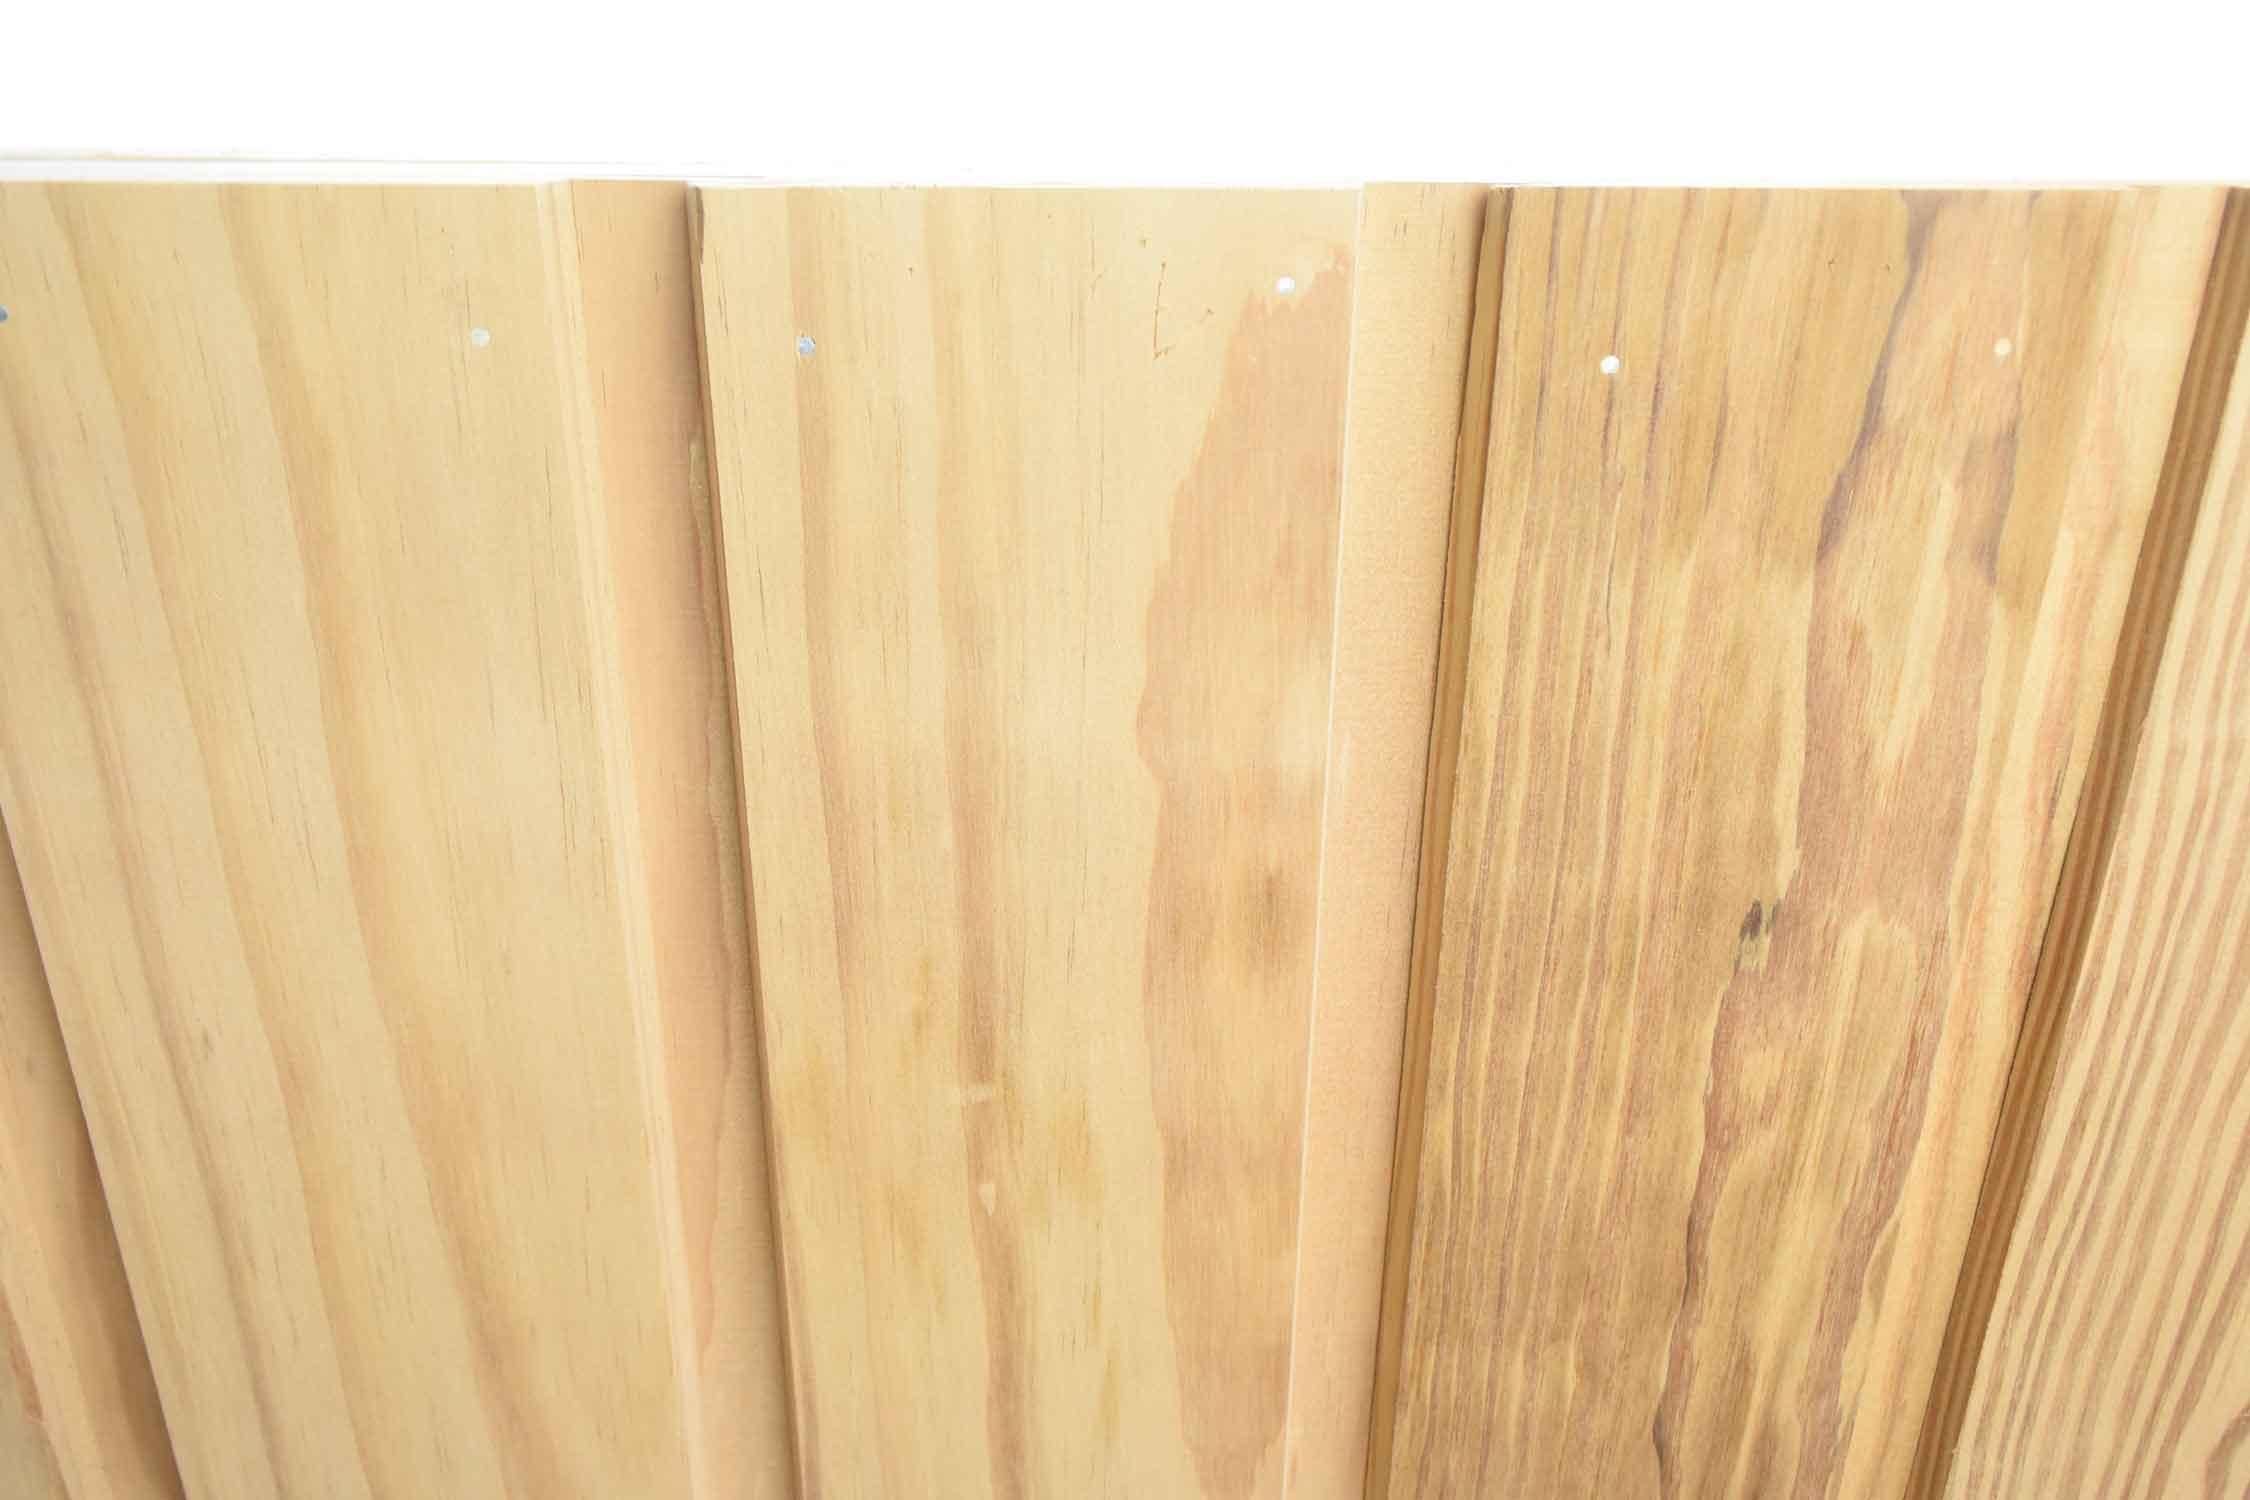 Southern Yellow Pine Channelsiding 21x130mm